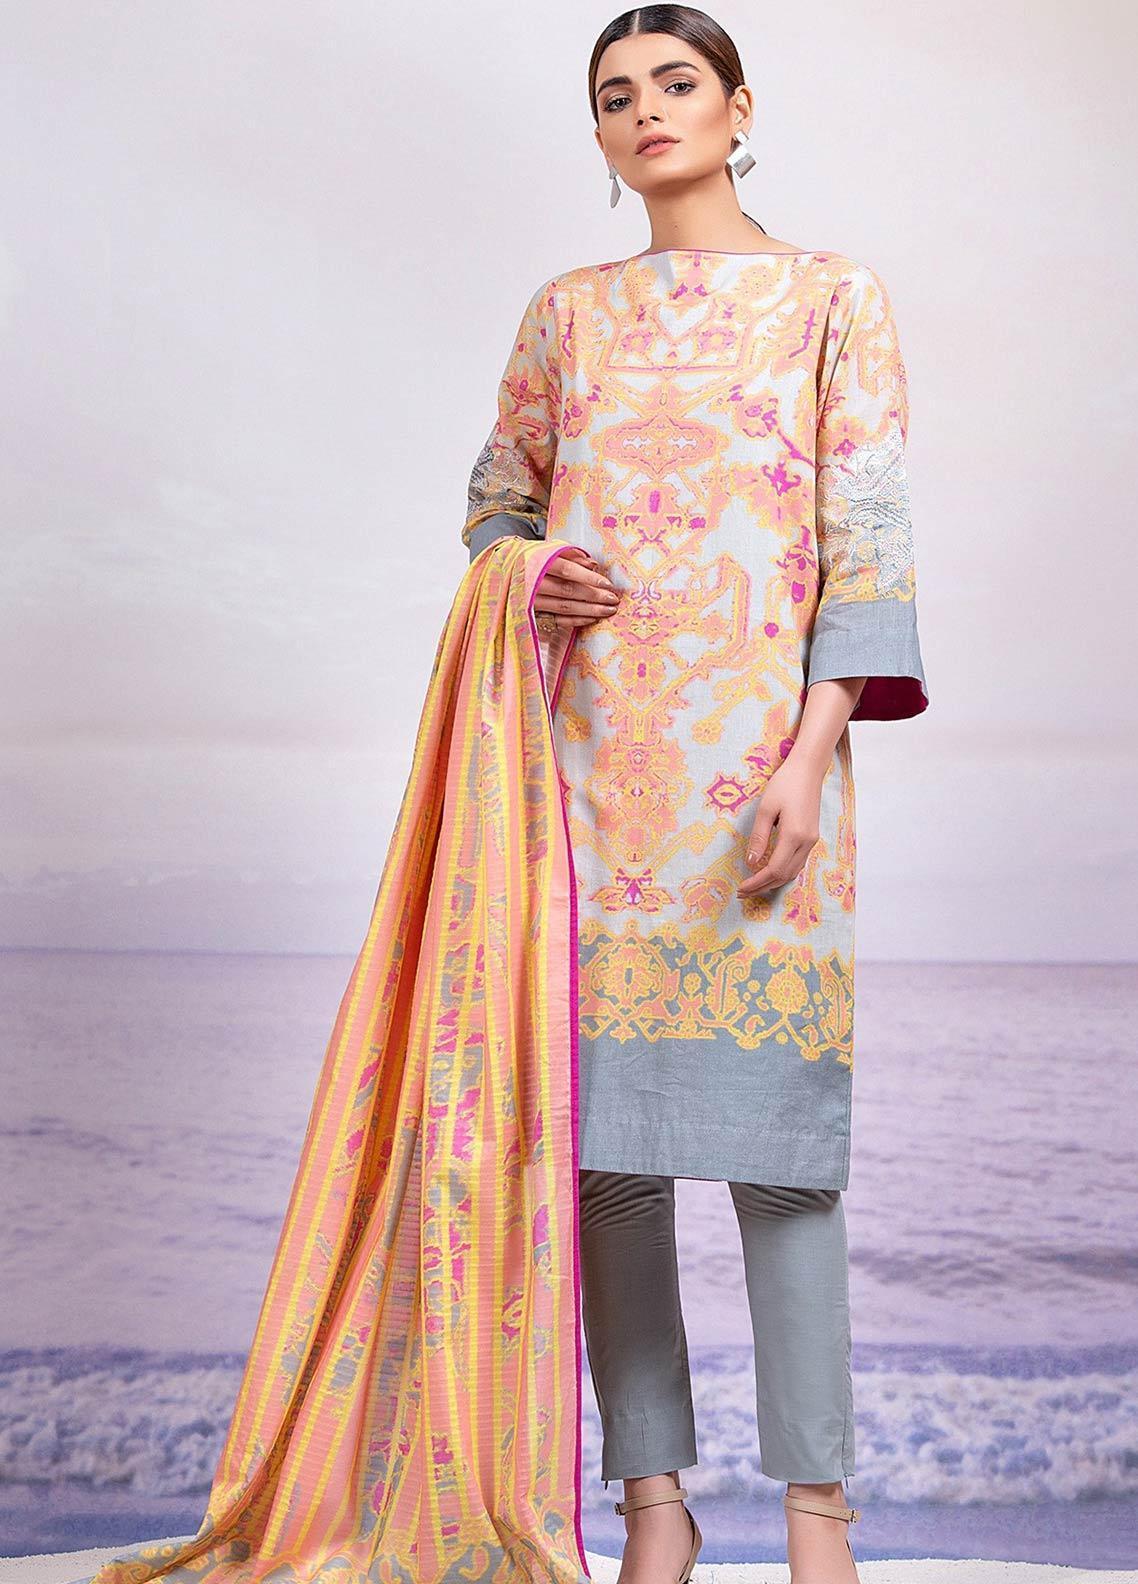 Al Karam Embroidered Lawn Unstitched 2 Piece Suit AK19-L2 13 ORANGE - Spring / Summer Collection